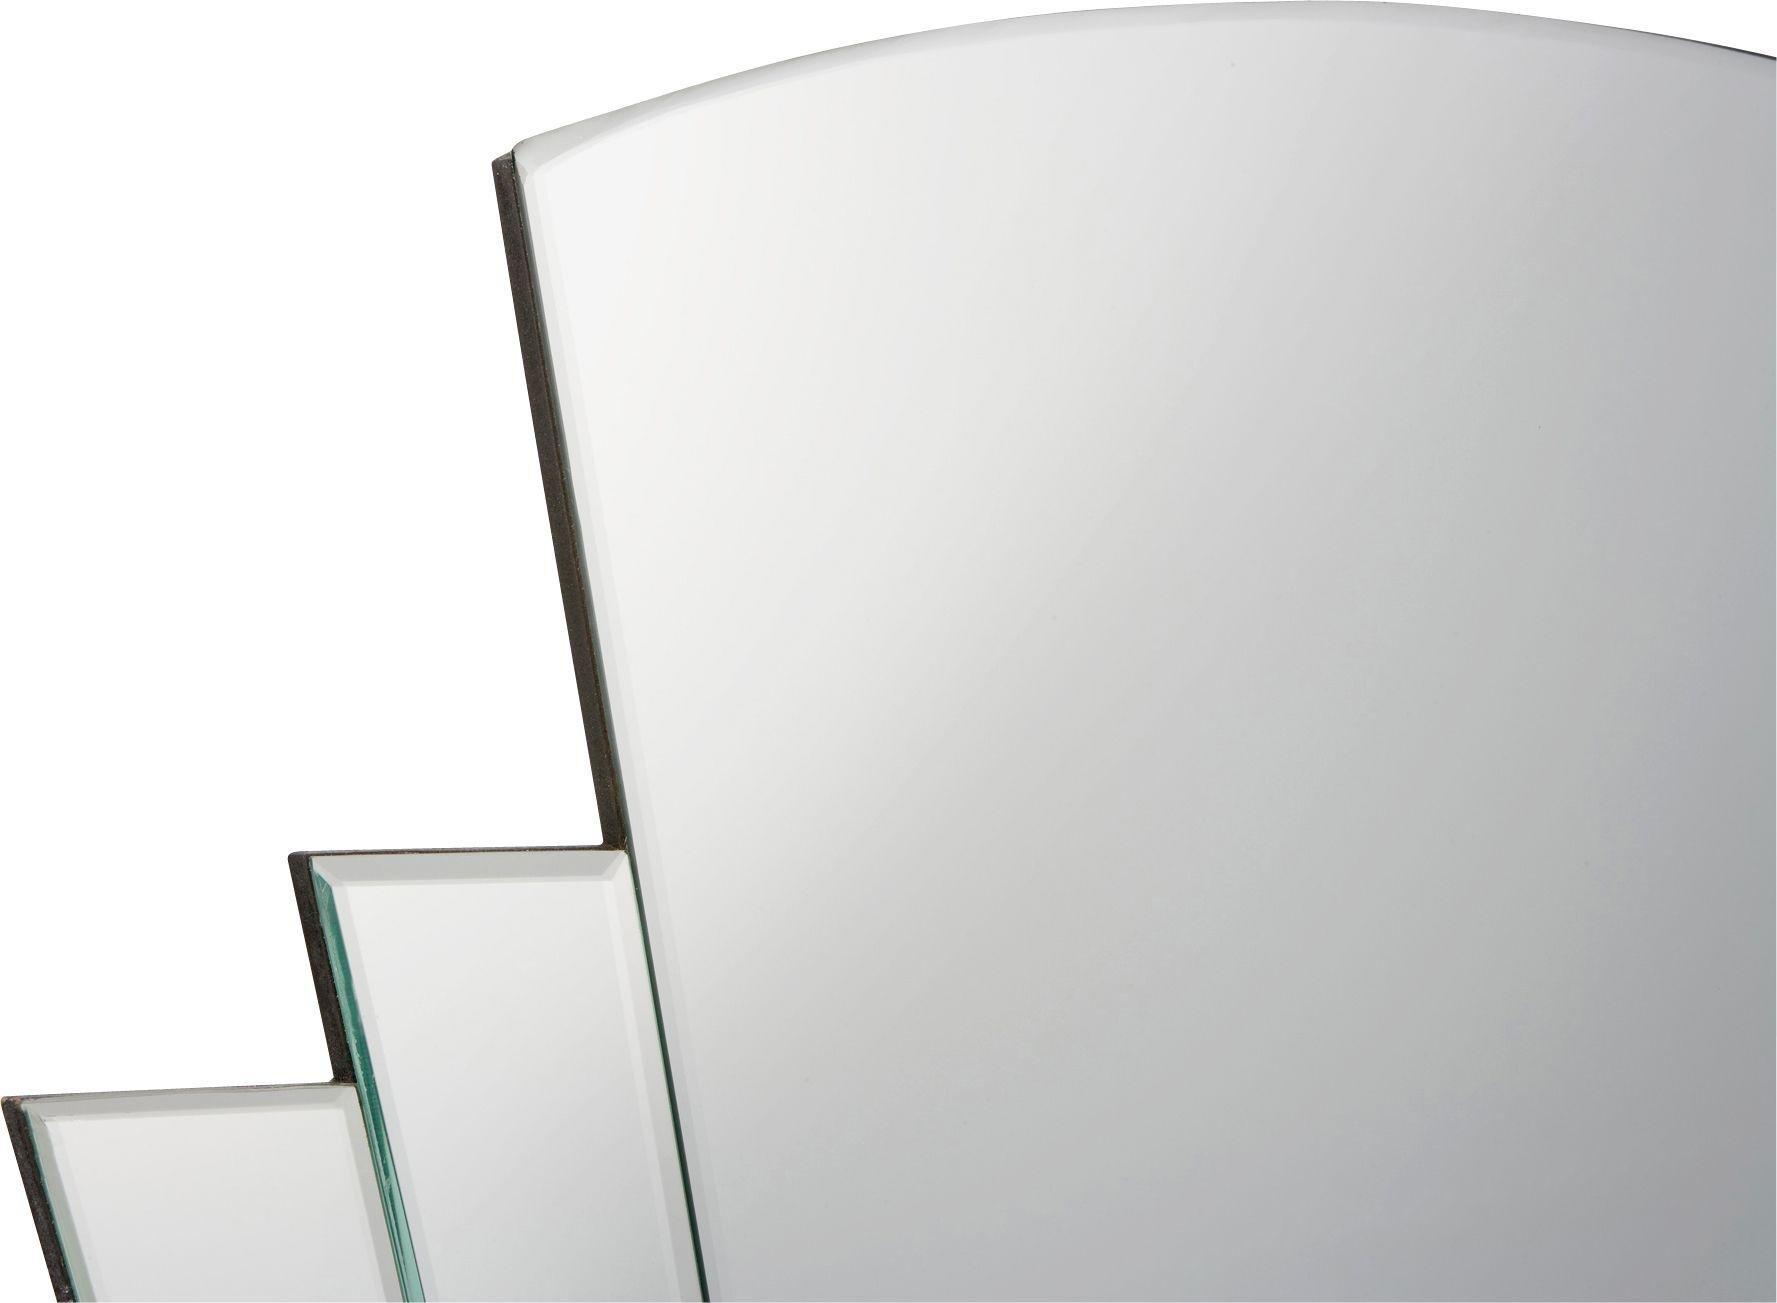 Contemporary Mirrors: Modern Mirrors, Floor Mirrors, Wall